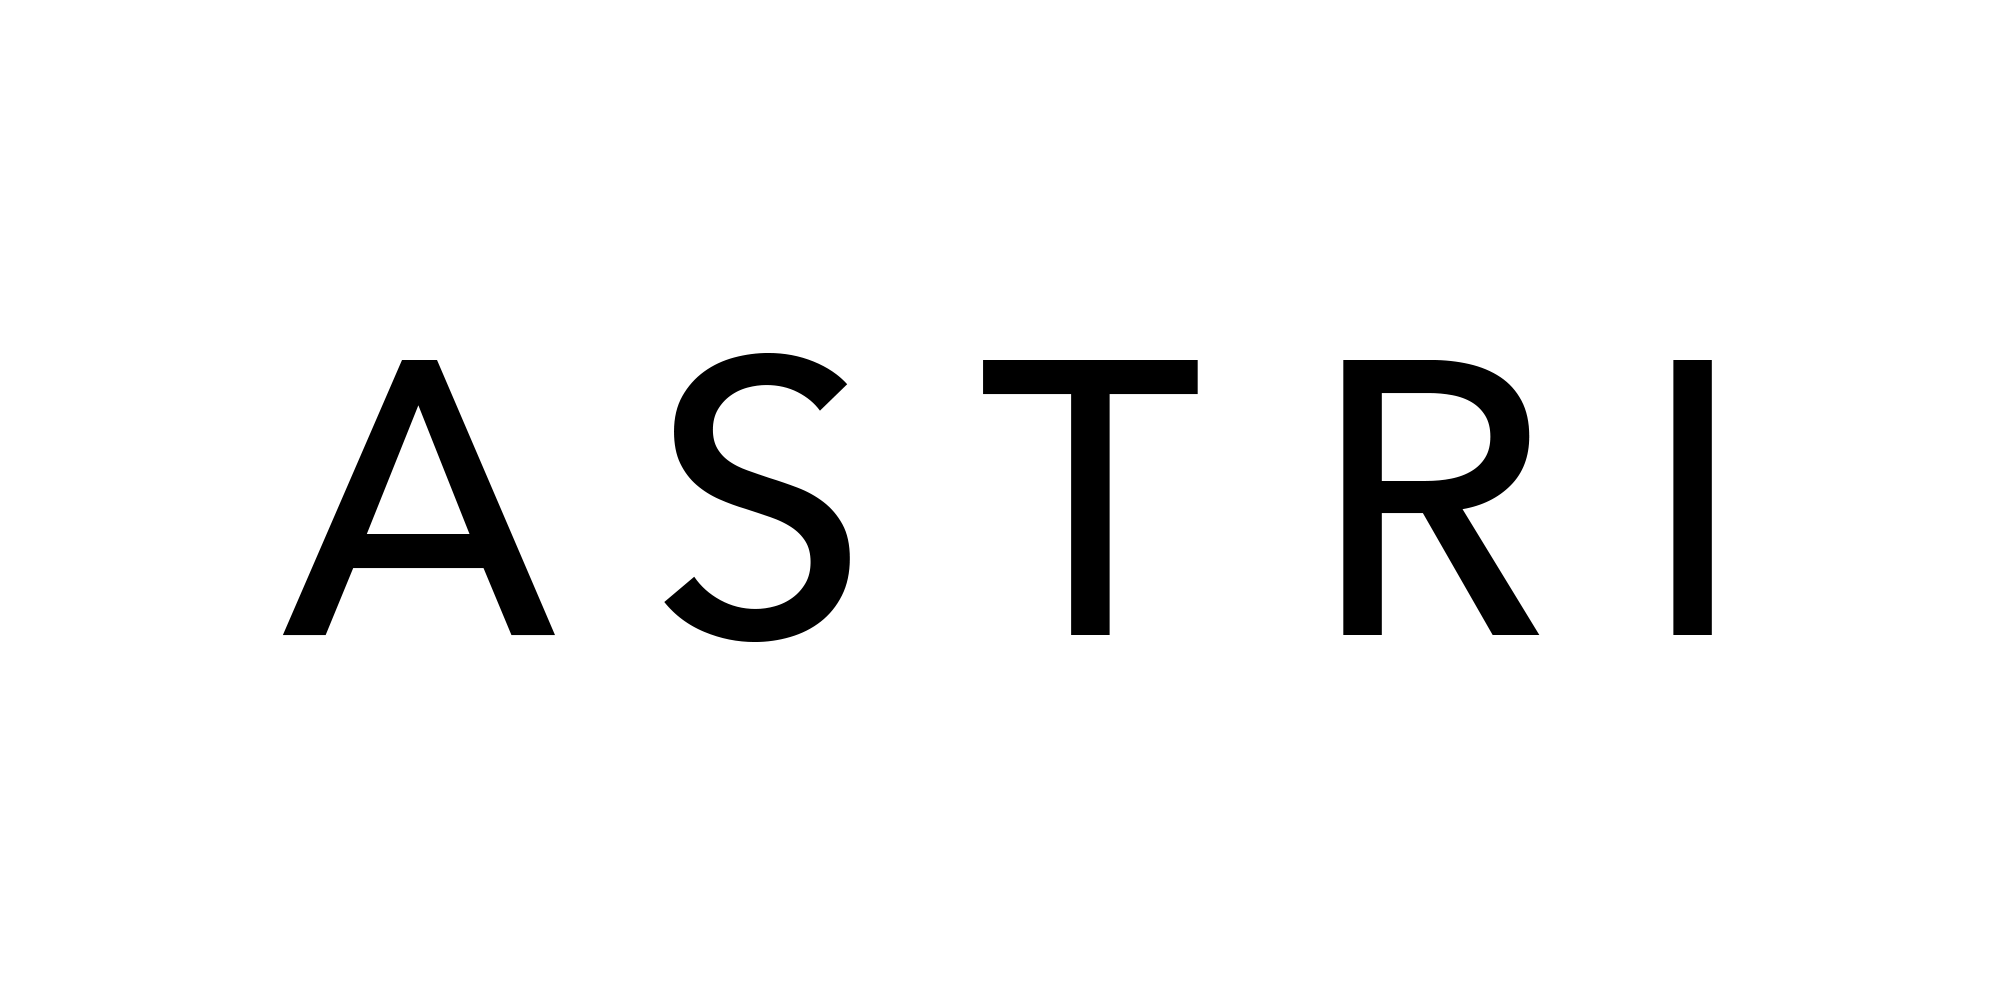 dff846c90ba Mikropinnad Balti Jaama Turul – Astri Grupi klienditugi